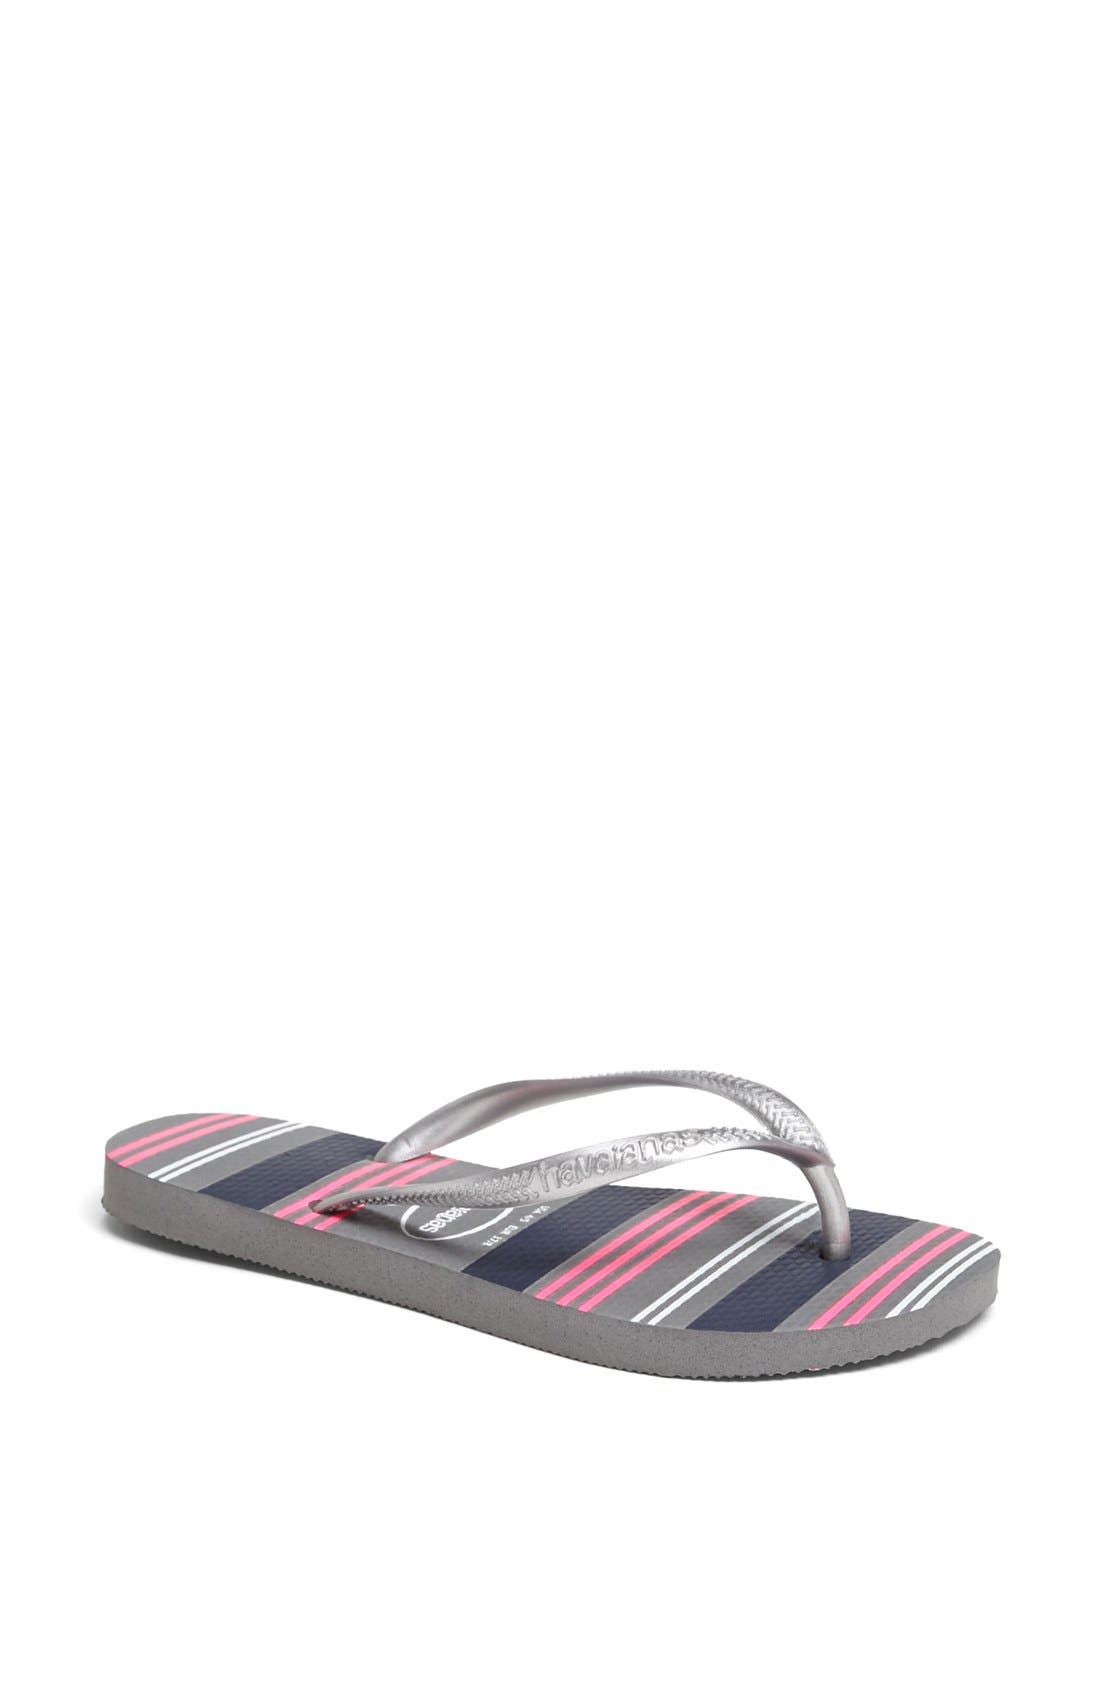 Alternate Image 1 Selected - Havaianas 'Slim - Neon Stripes' Sandal